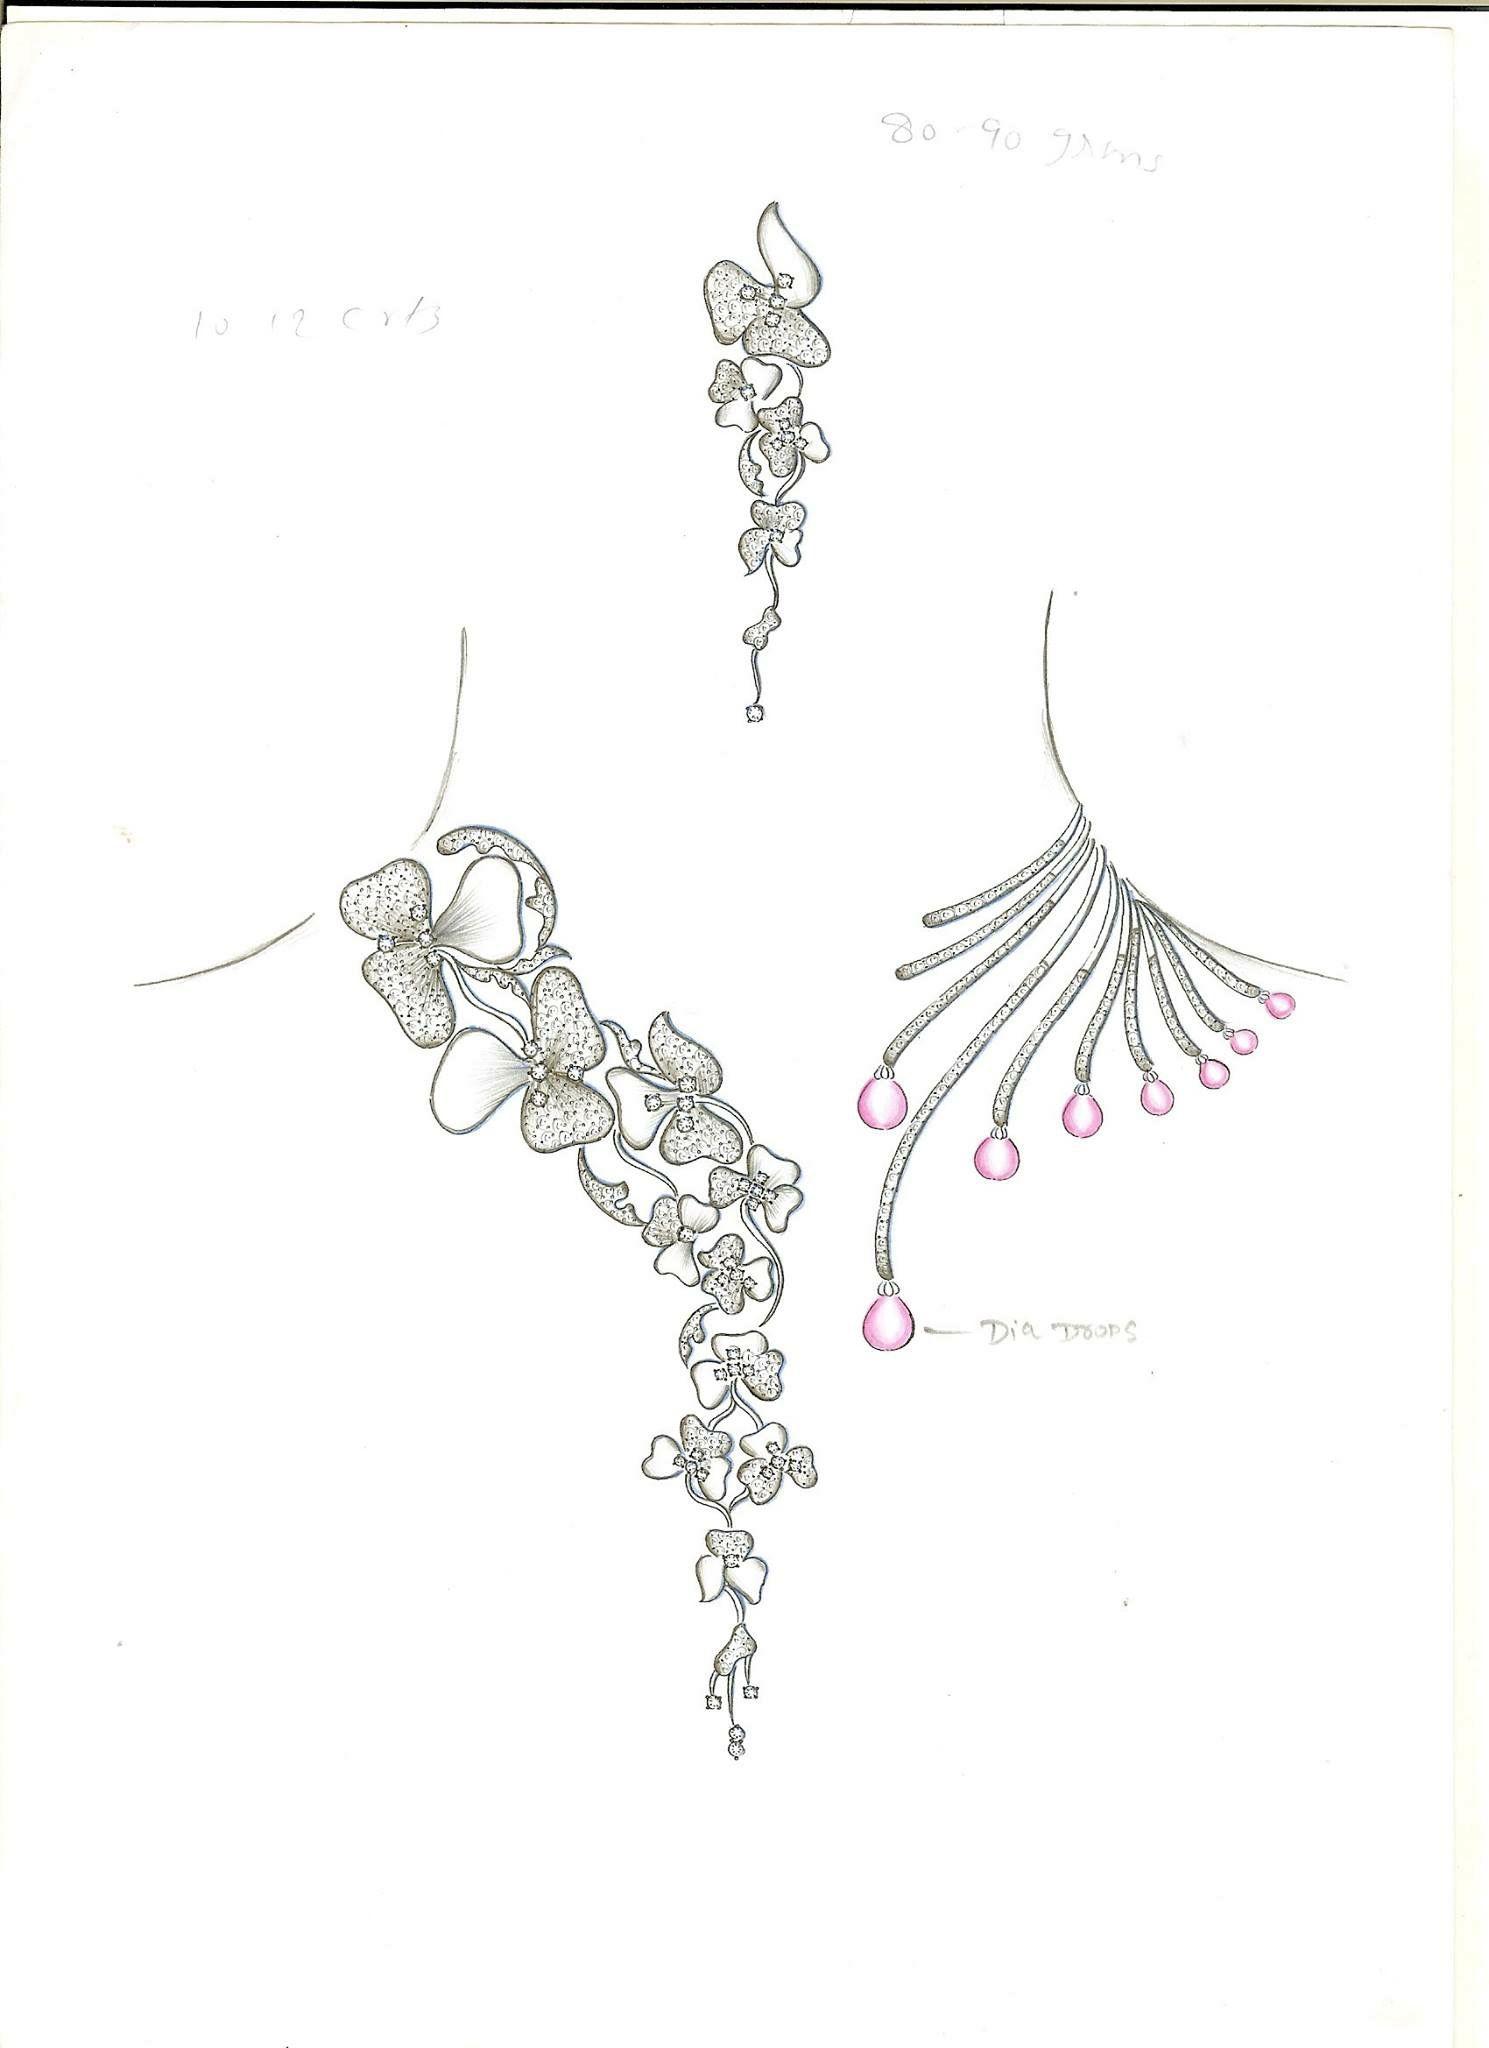 Pin by Janki Parekh on Jewelry in 2019 | Jewelry drawing ...